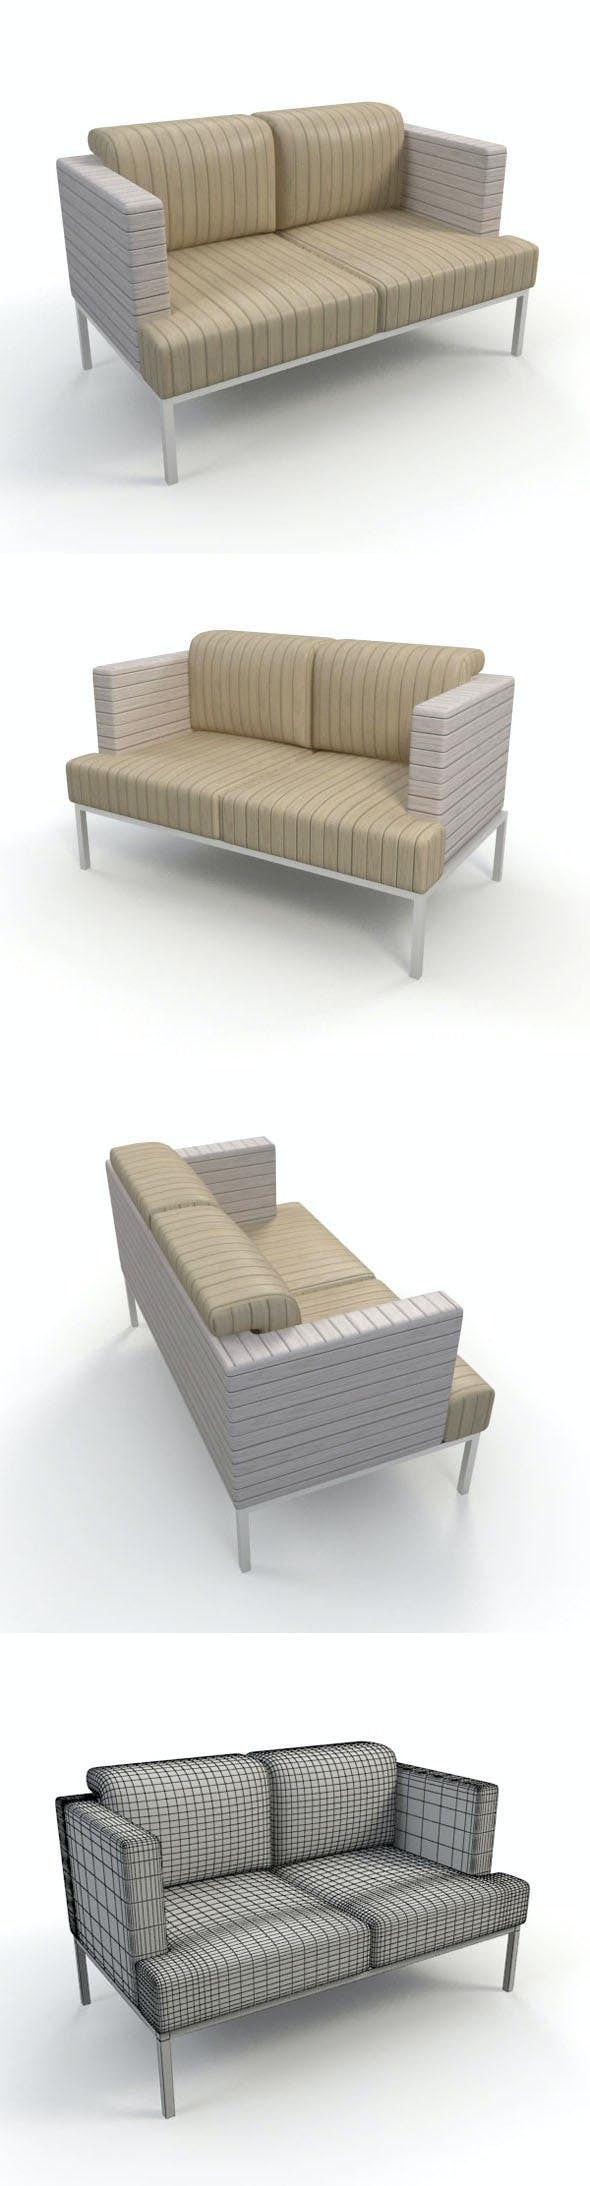 Sofa_14 - 3DOcean Item for Sale